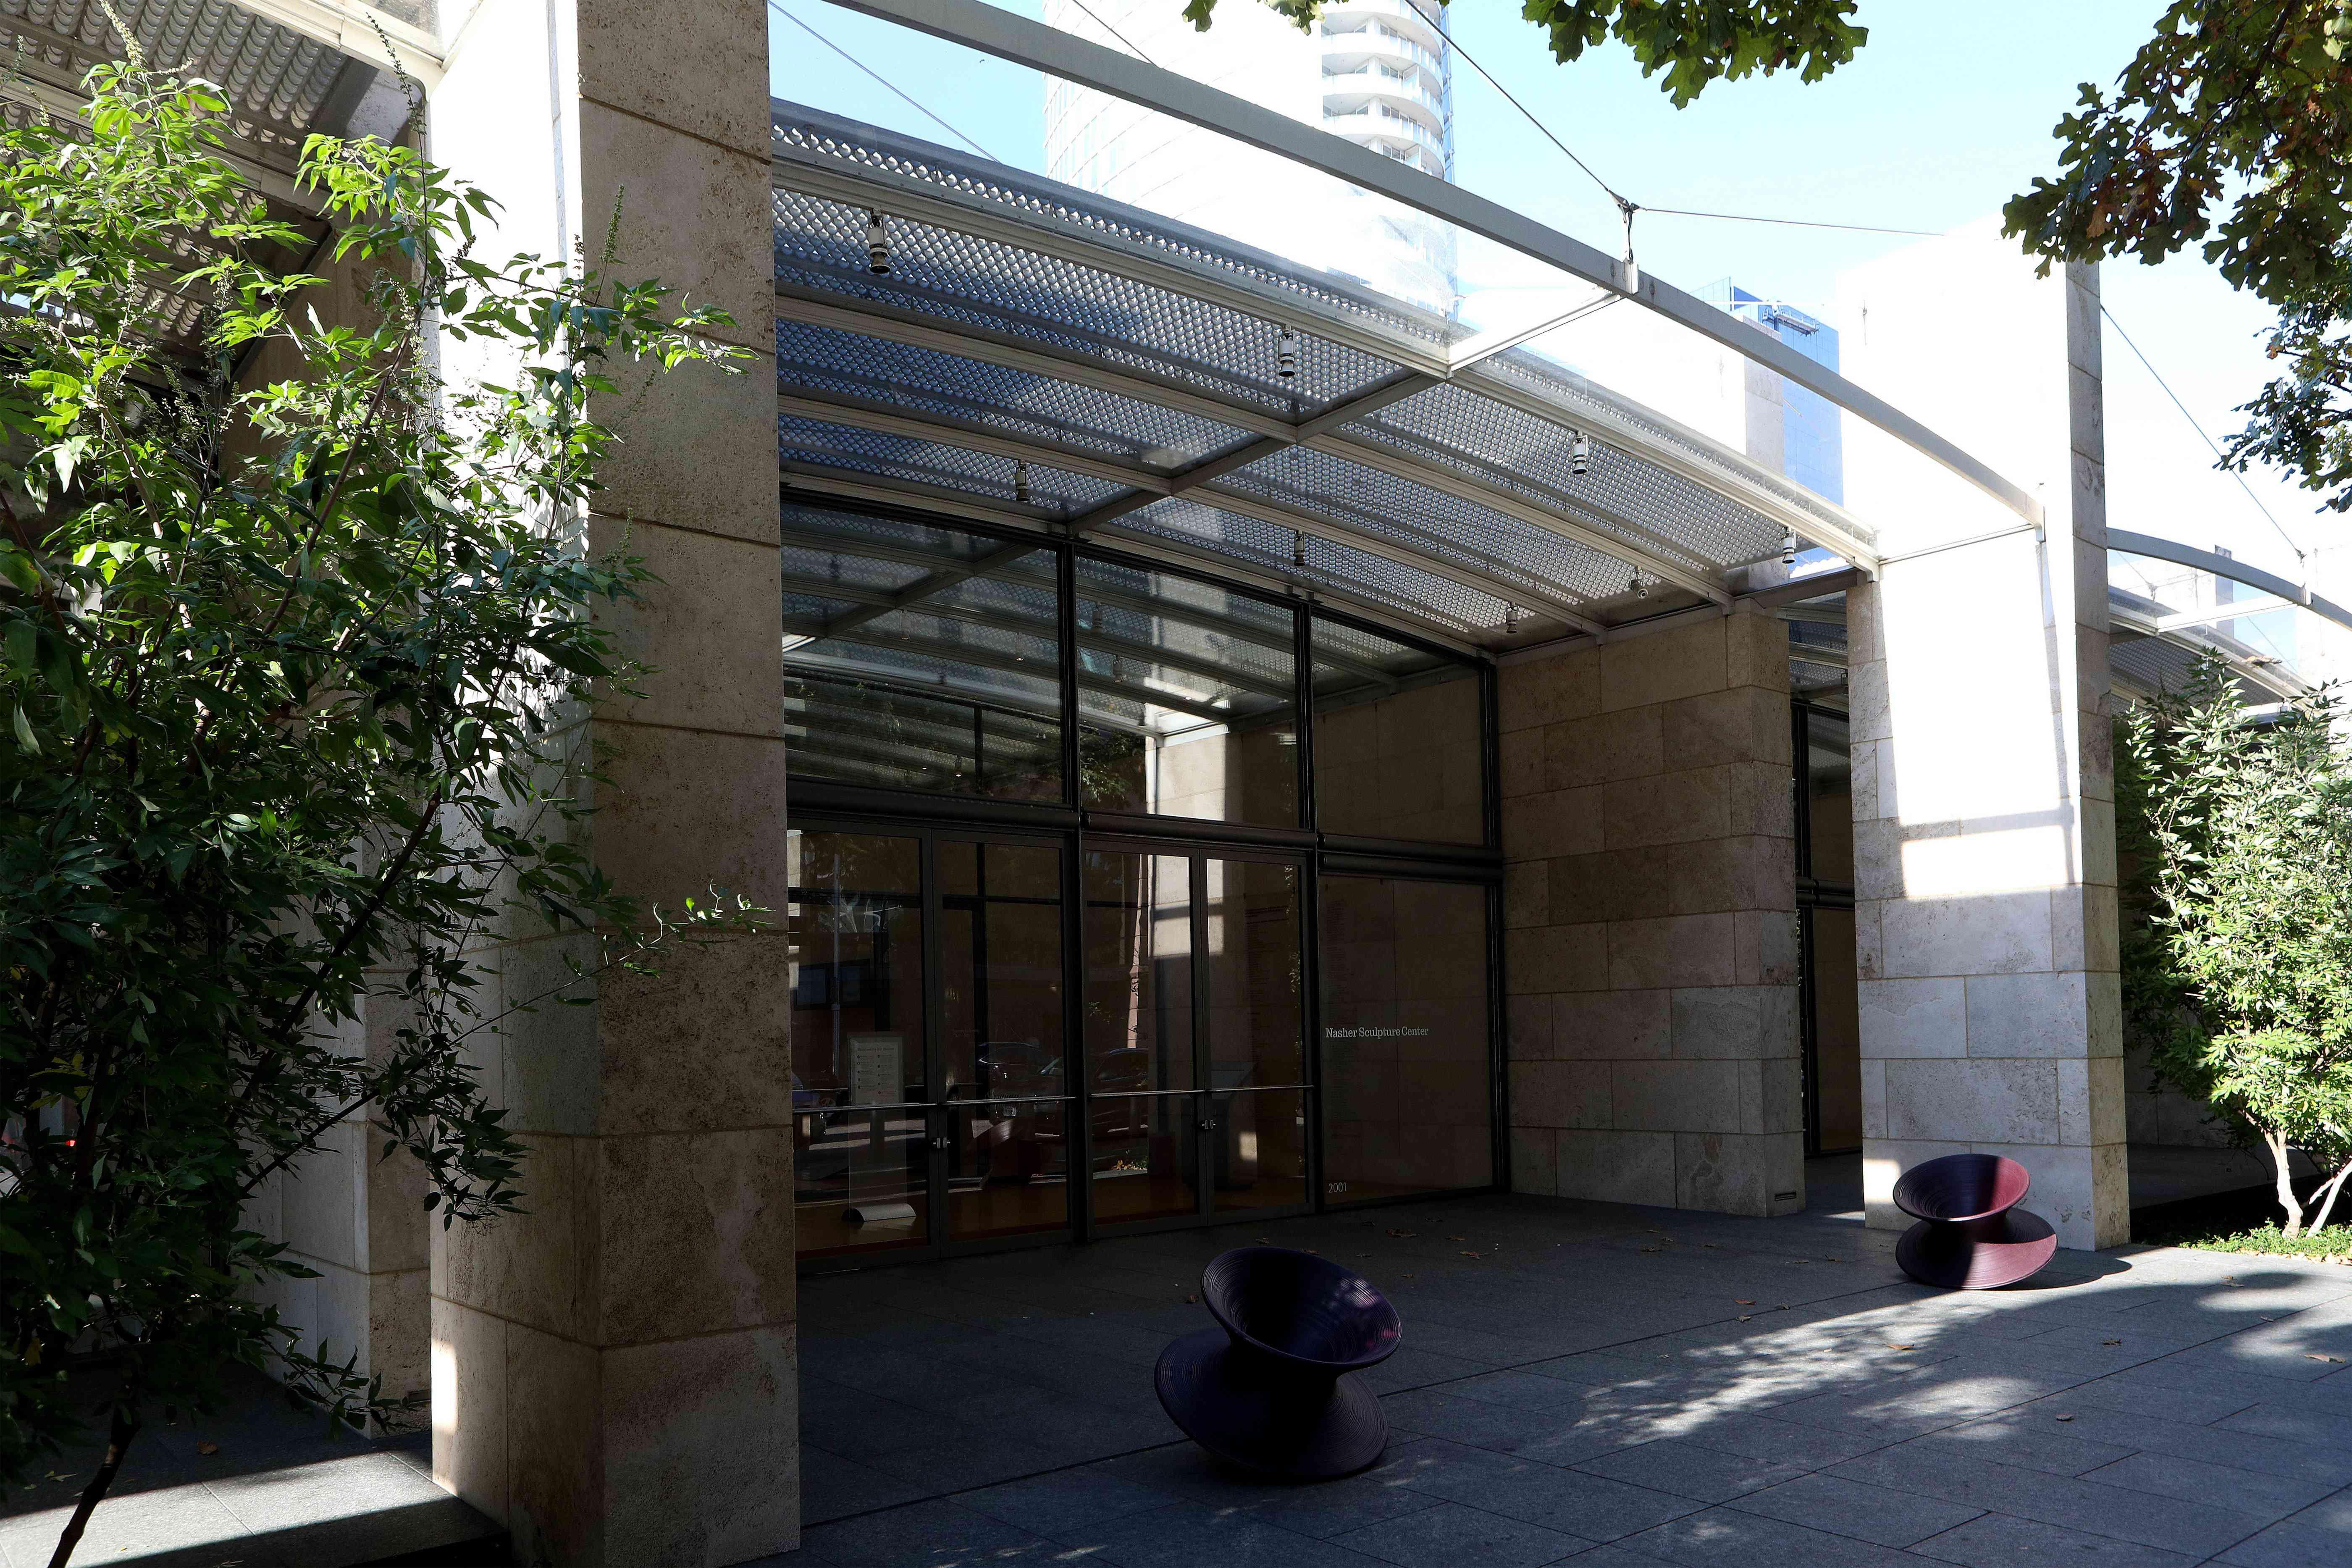 Nasher Sculpture Center in downtown Dallas